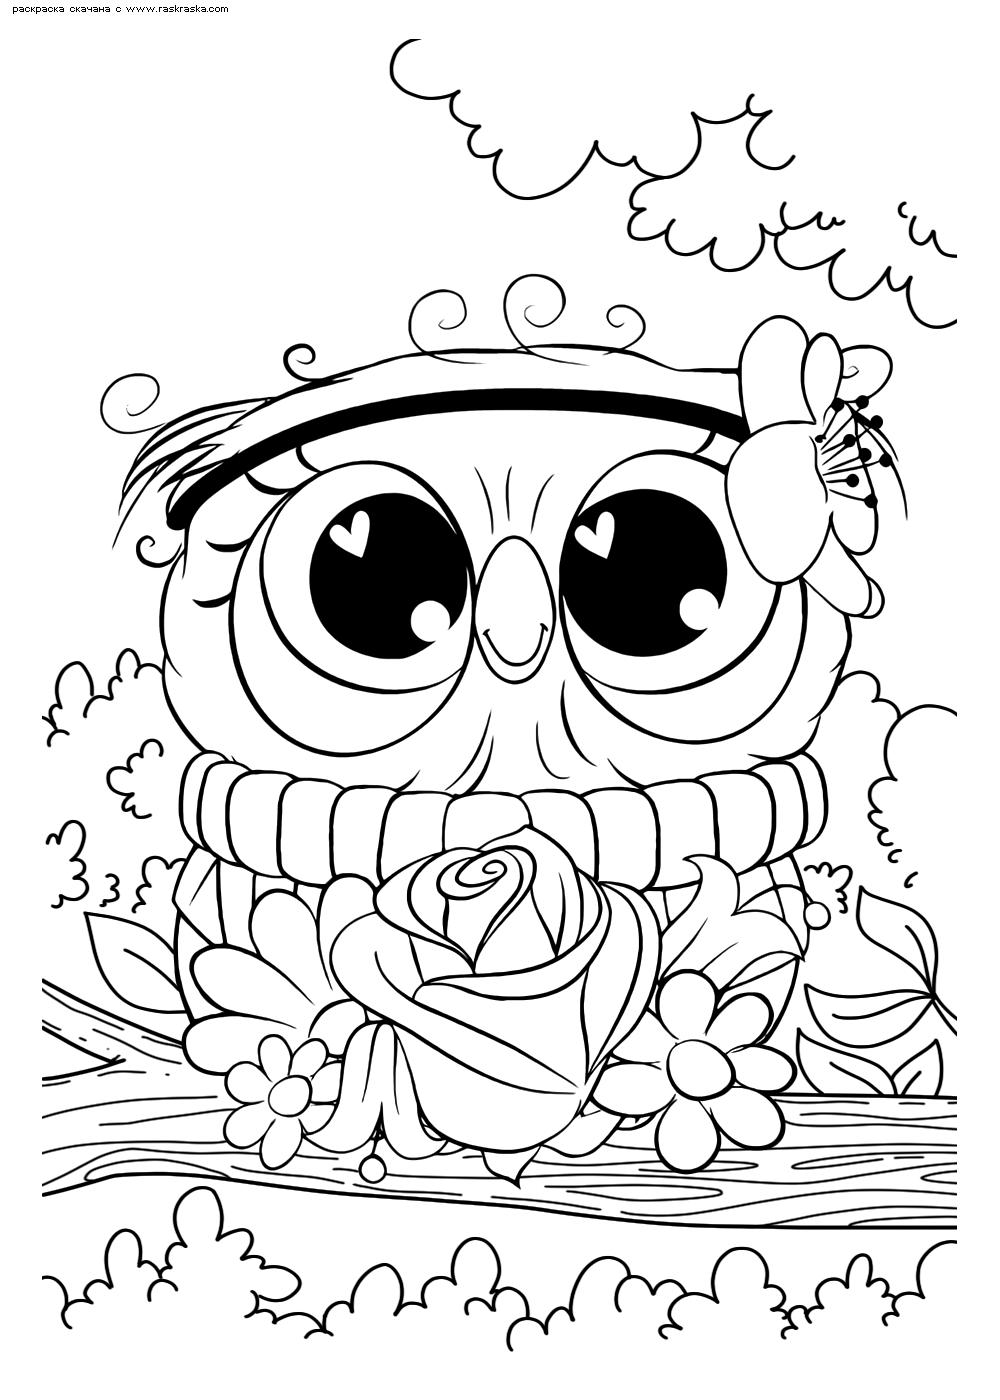 Раскраска Нарядная сова | Раскраски няшных животных. Милые ...